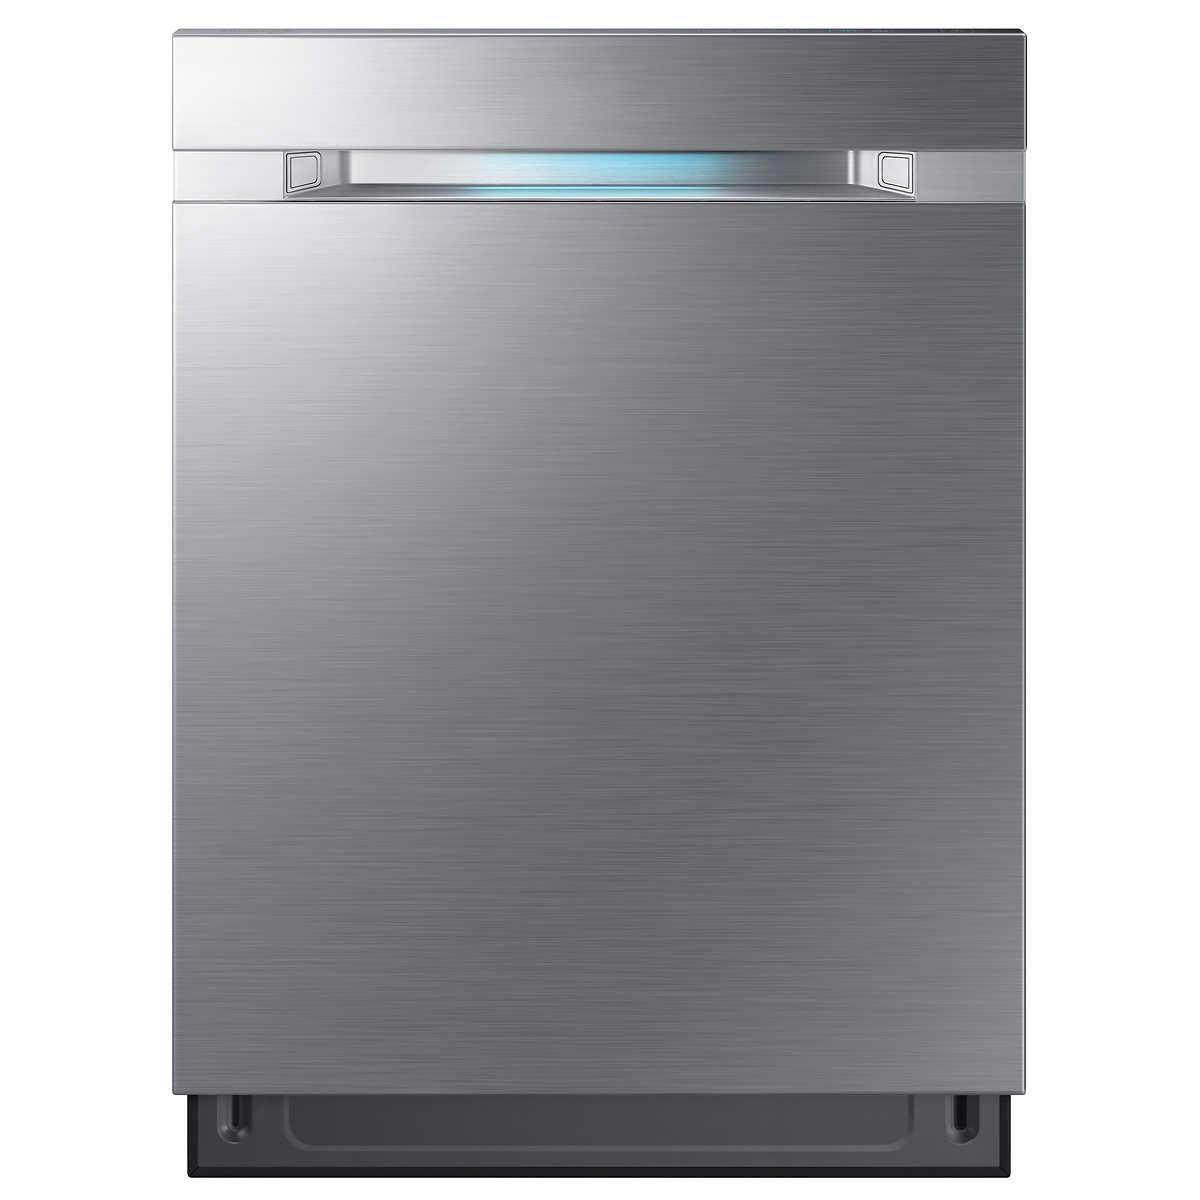 Dishwasher Purchase And Installation Dishwashers Costco